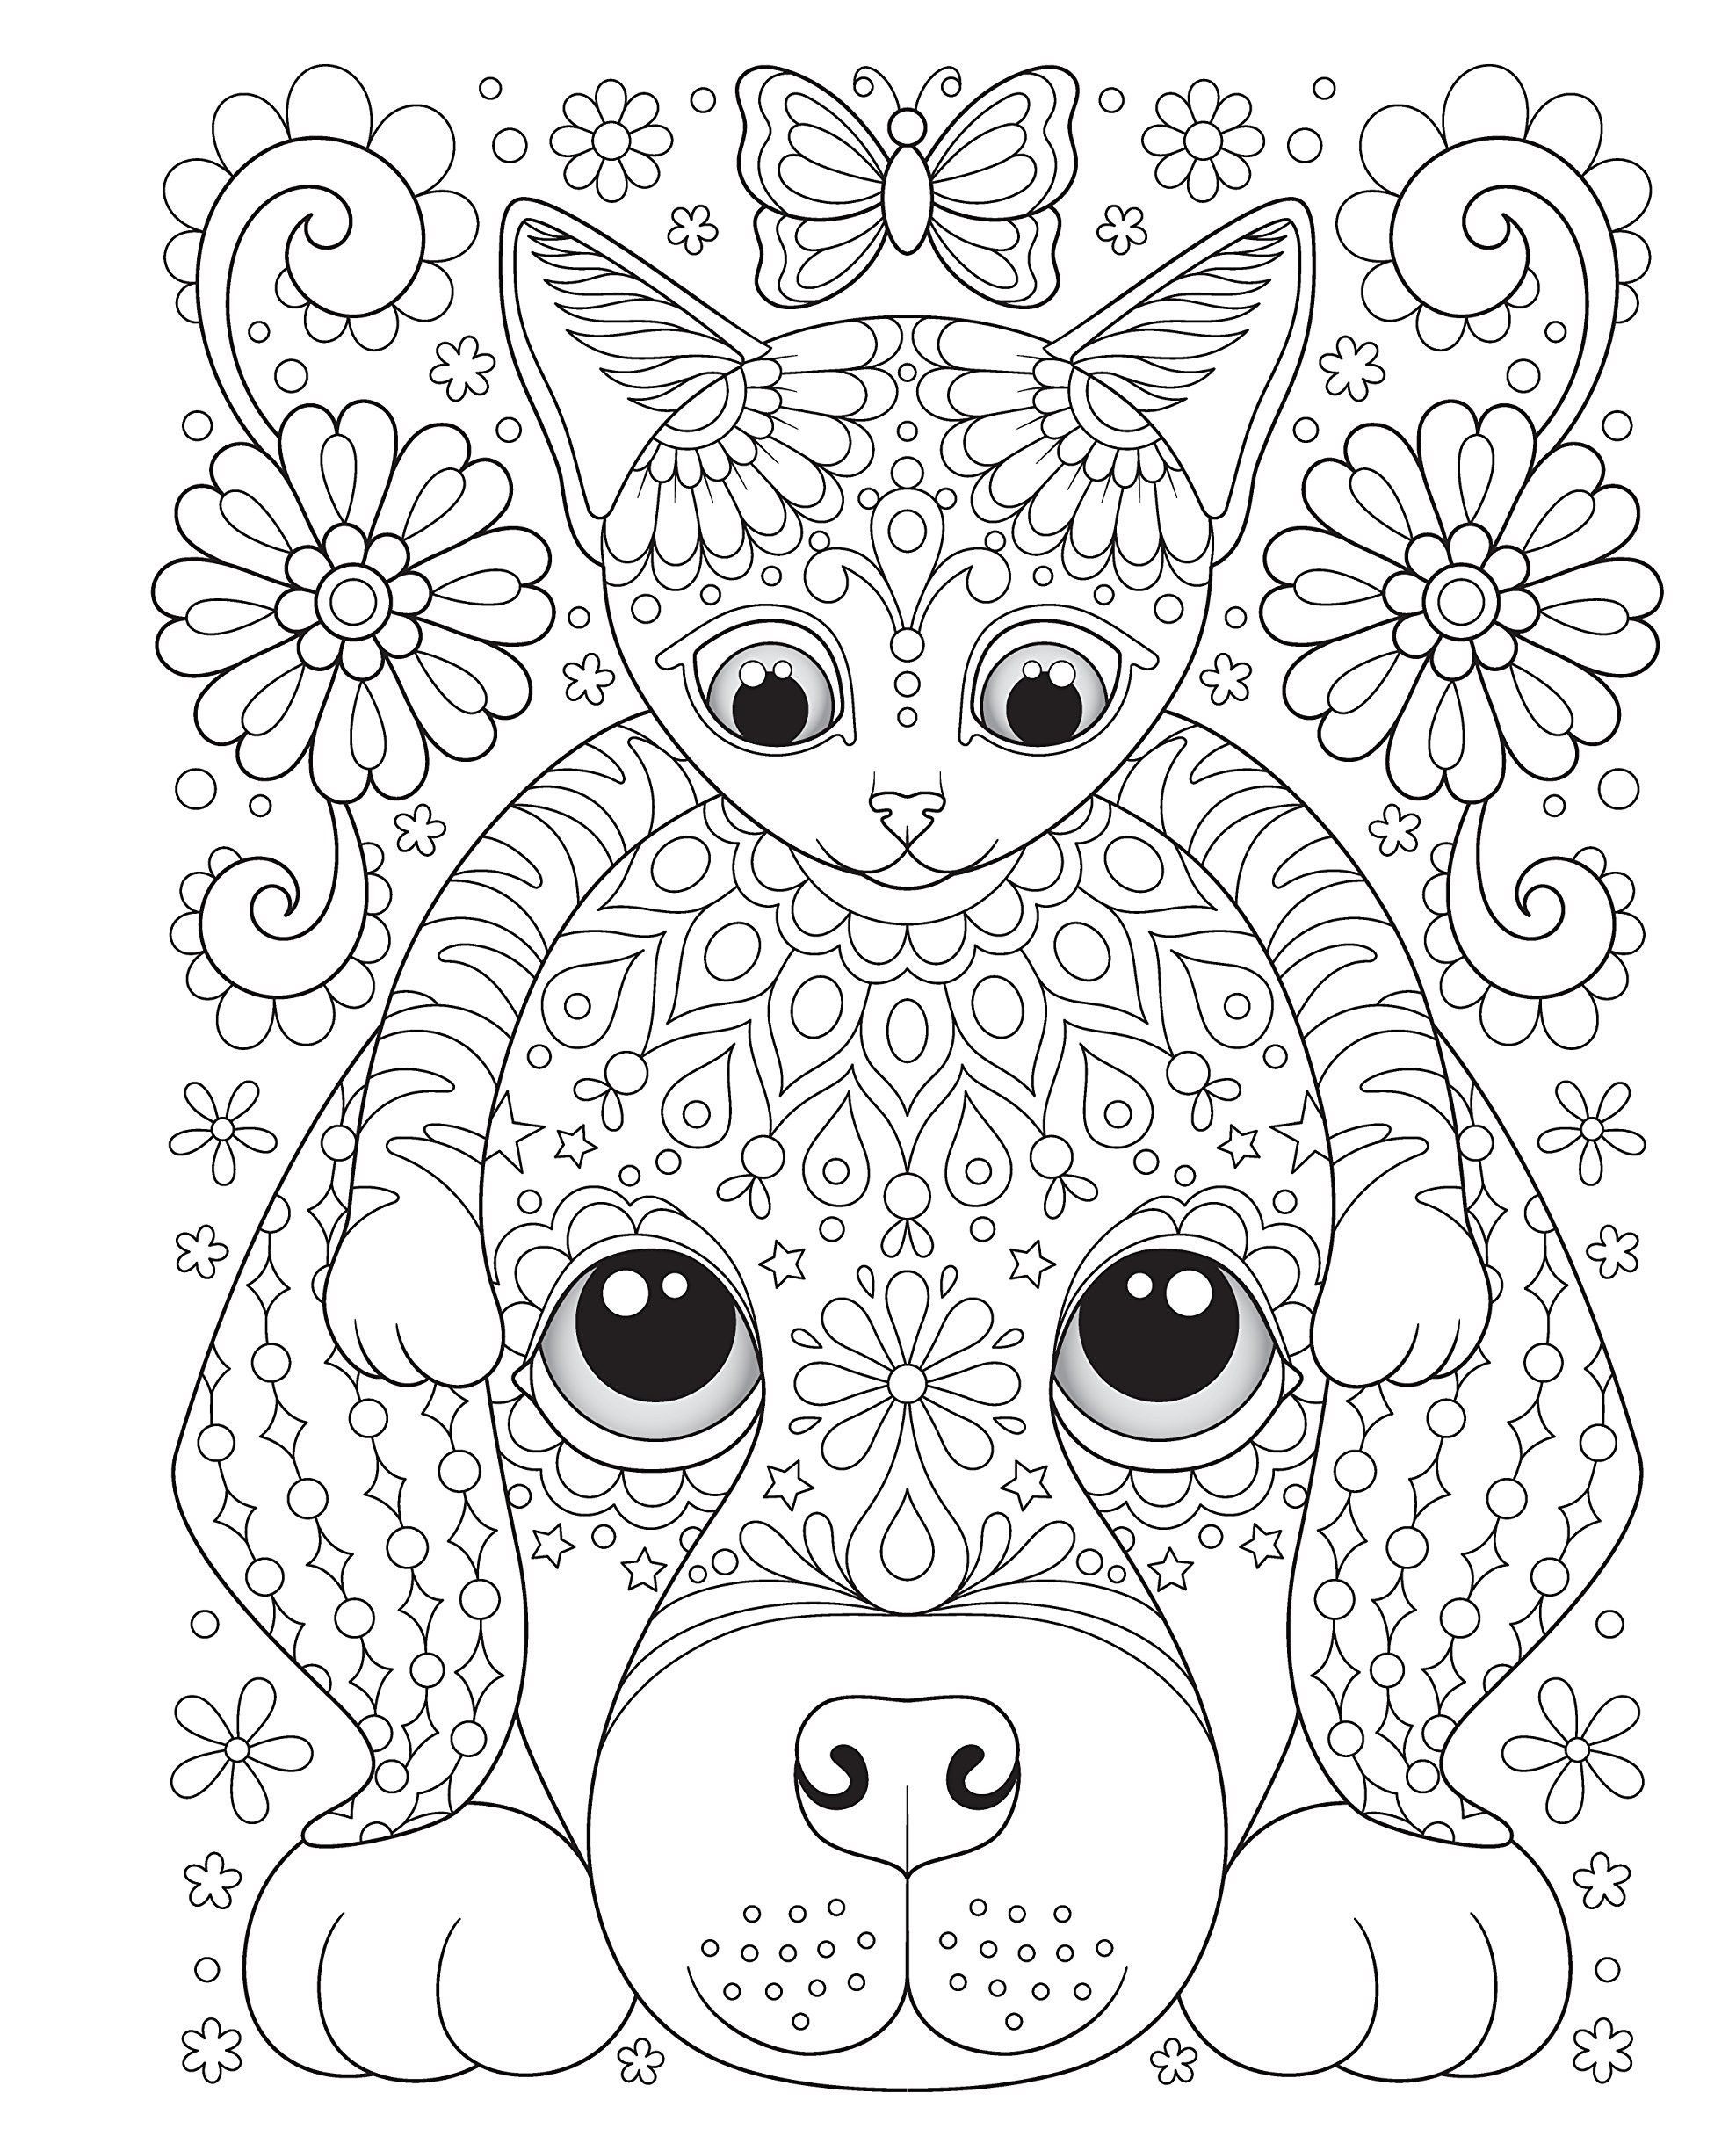 Дружба - кошка и собака - Животные | Раскраски мандала ...